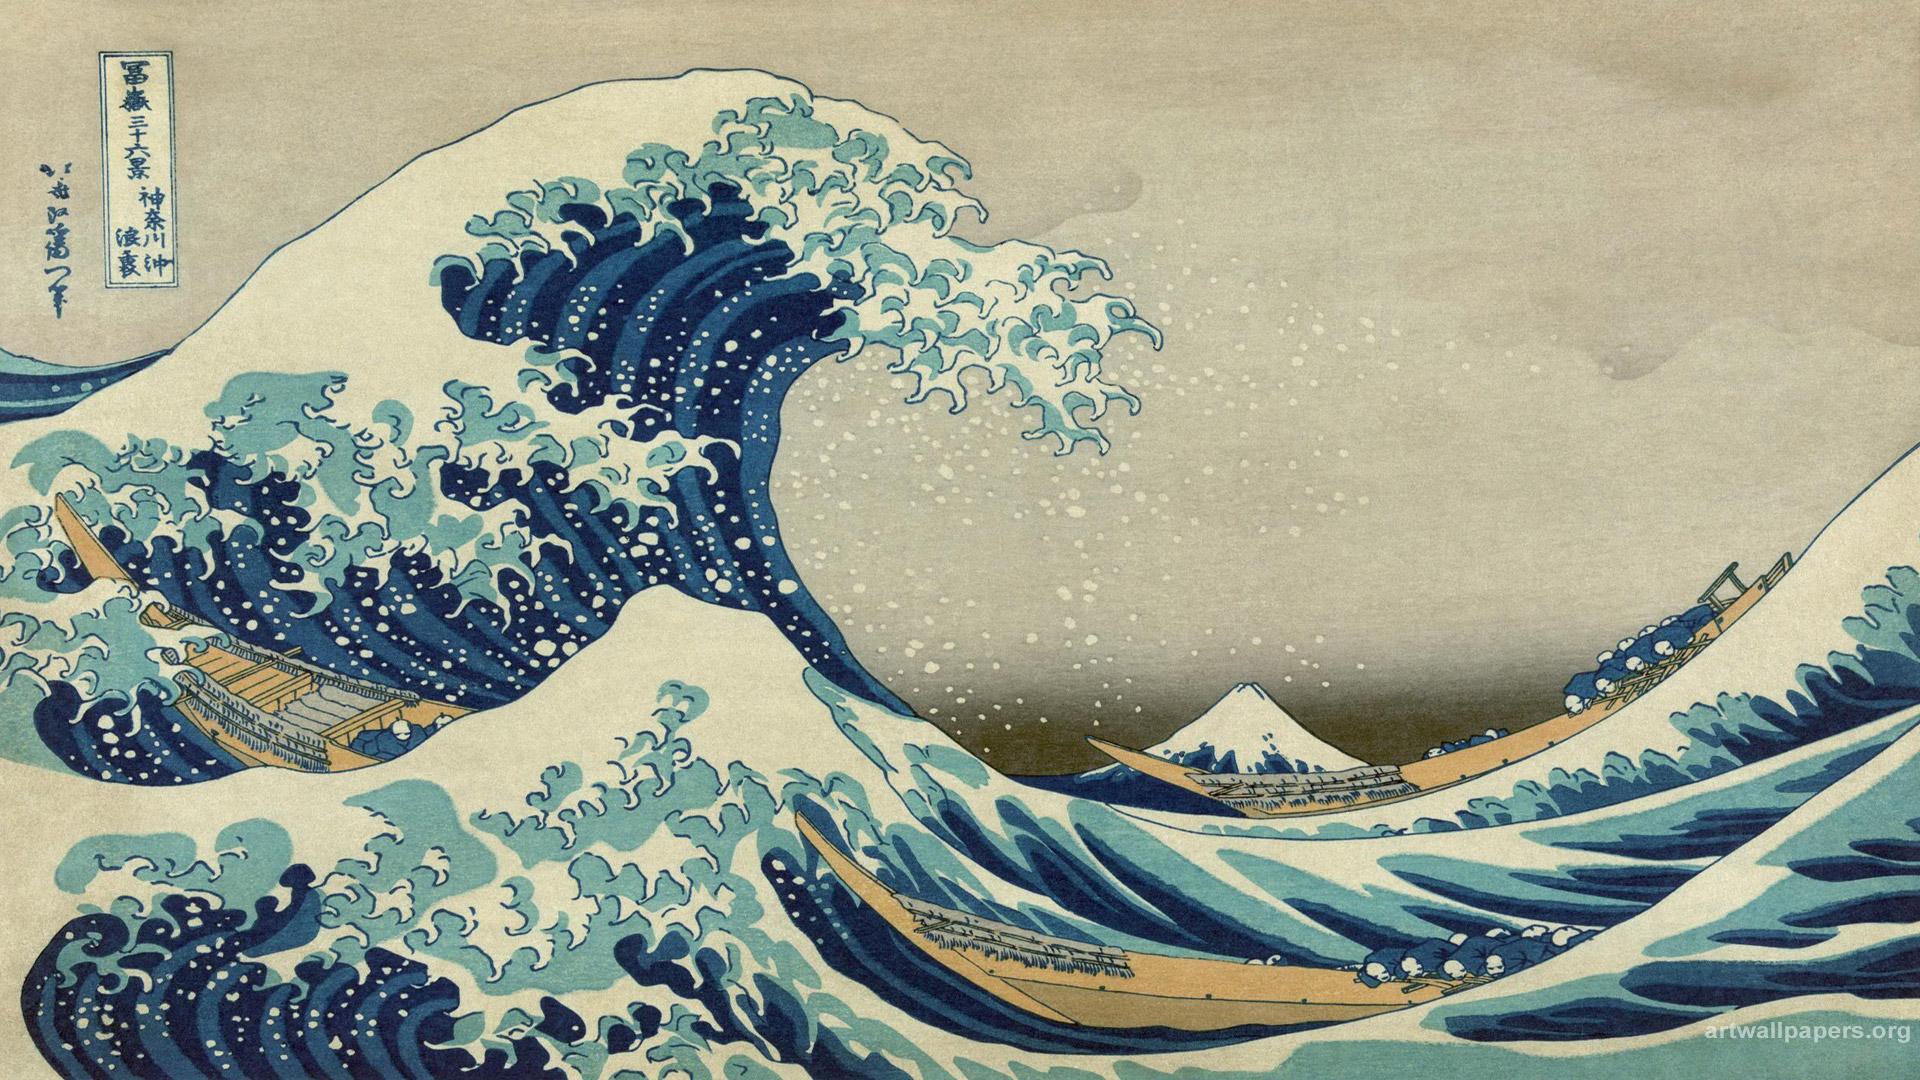 hokusai katsushika [1920x1080] wallpaper 1920x1080